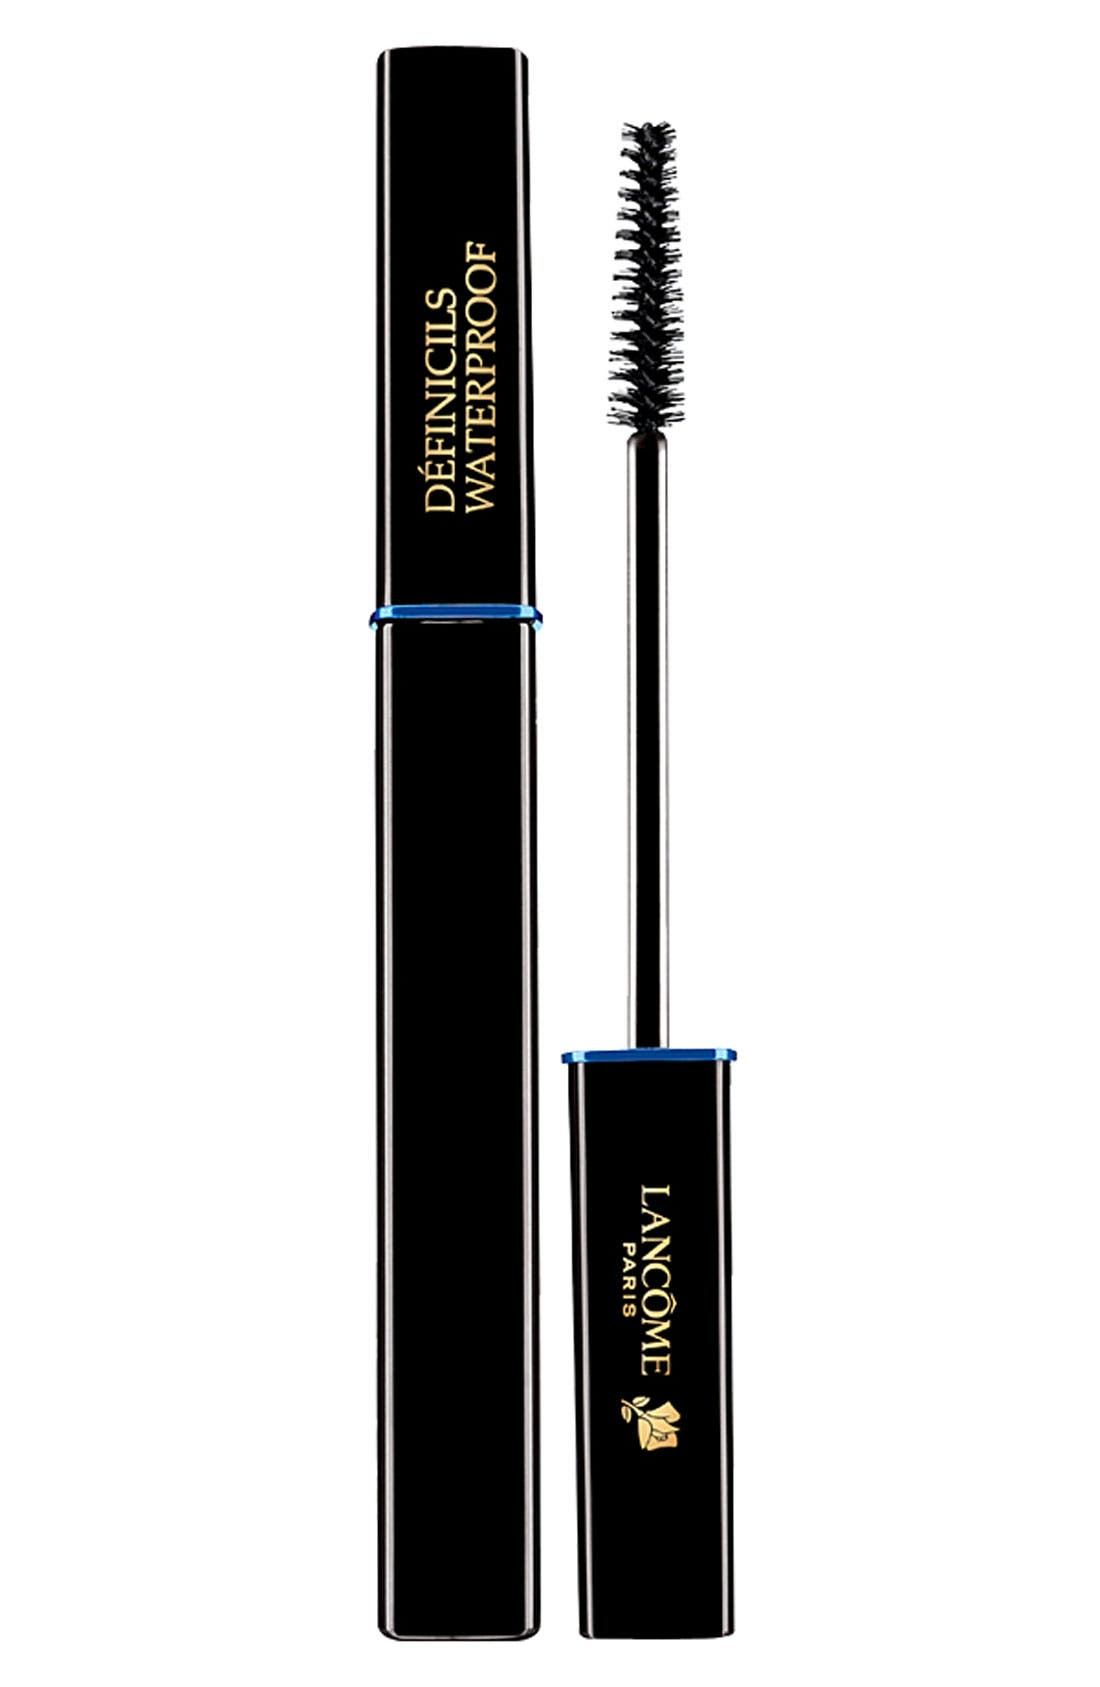 Lancôme Définicils Lengthening and Defining Waterproof Mascara